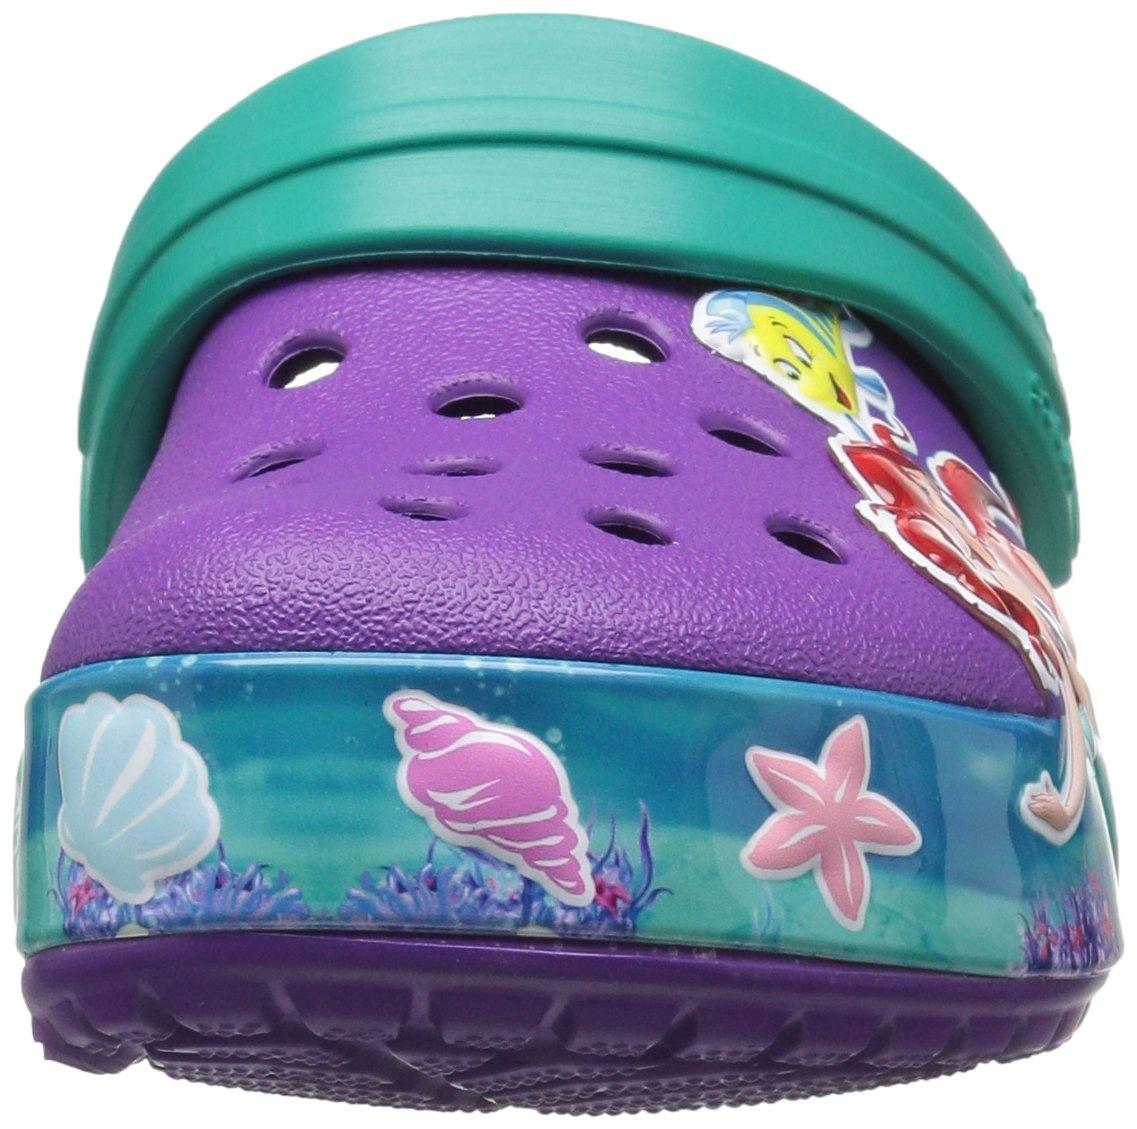 Crocs Girls' CB Princess Ariel K Clog, Amethyst, 13 M US Little Kid by Crocs (Image #4)